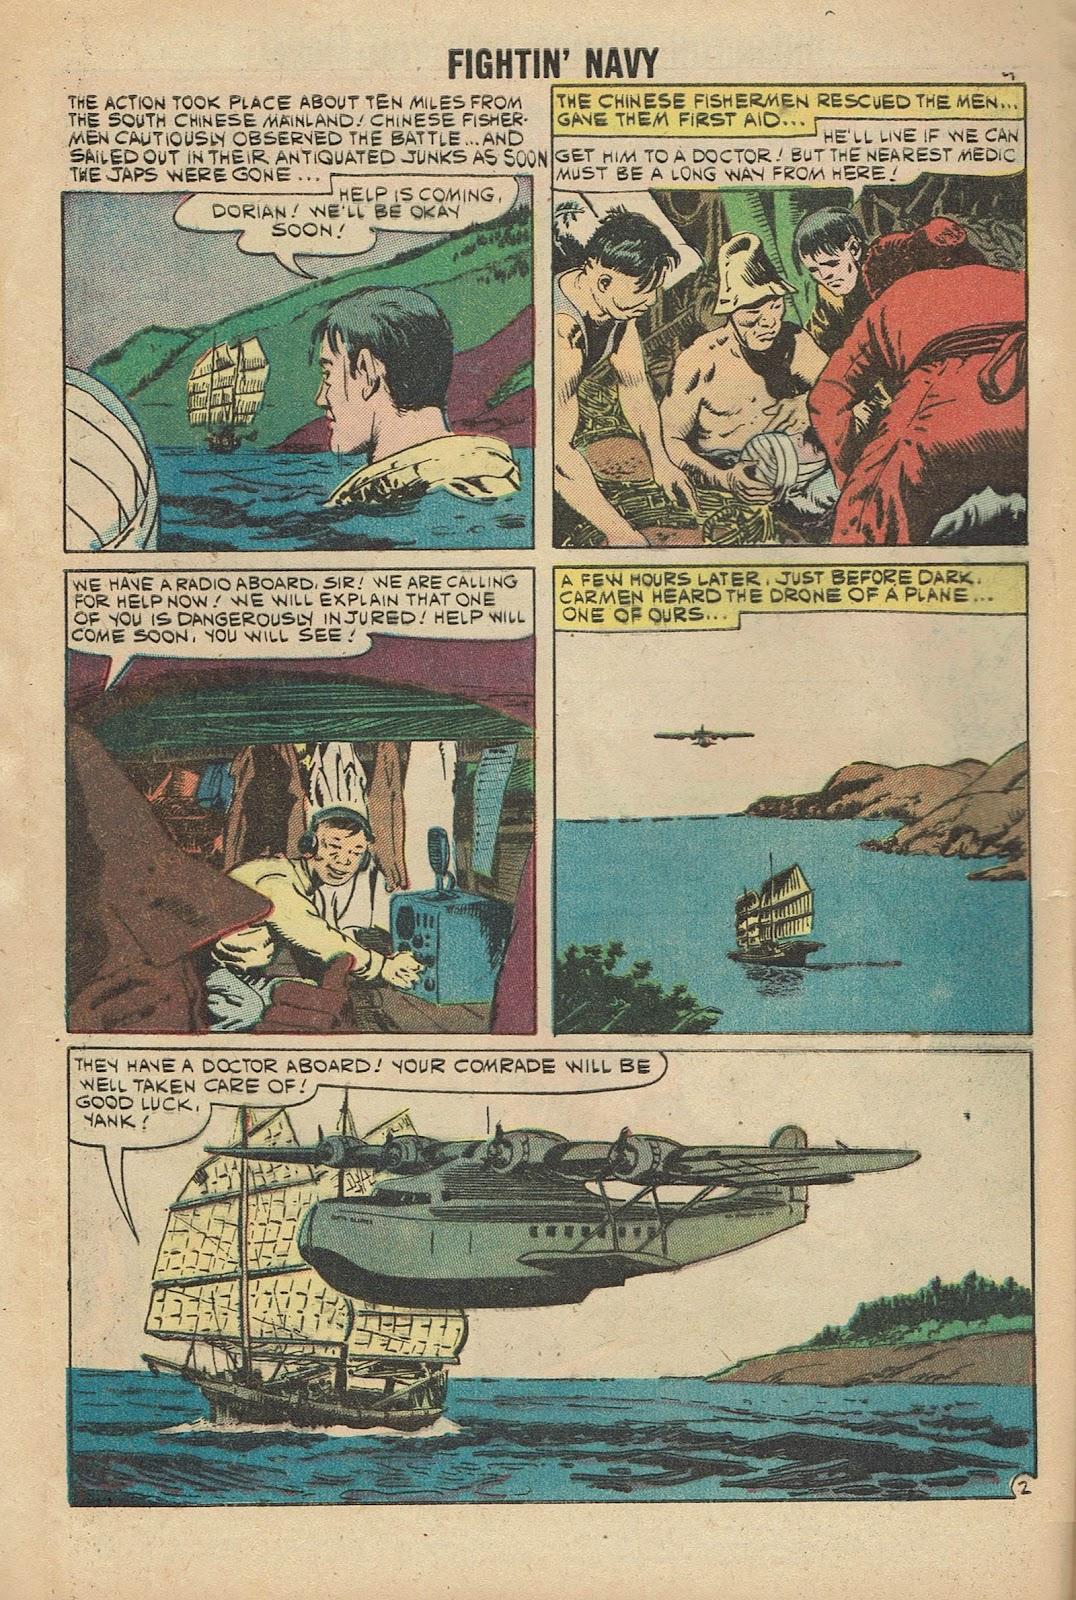 Read online Fightin' Navy comic -  Issue #96 - 4